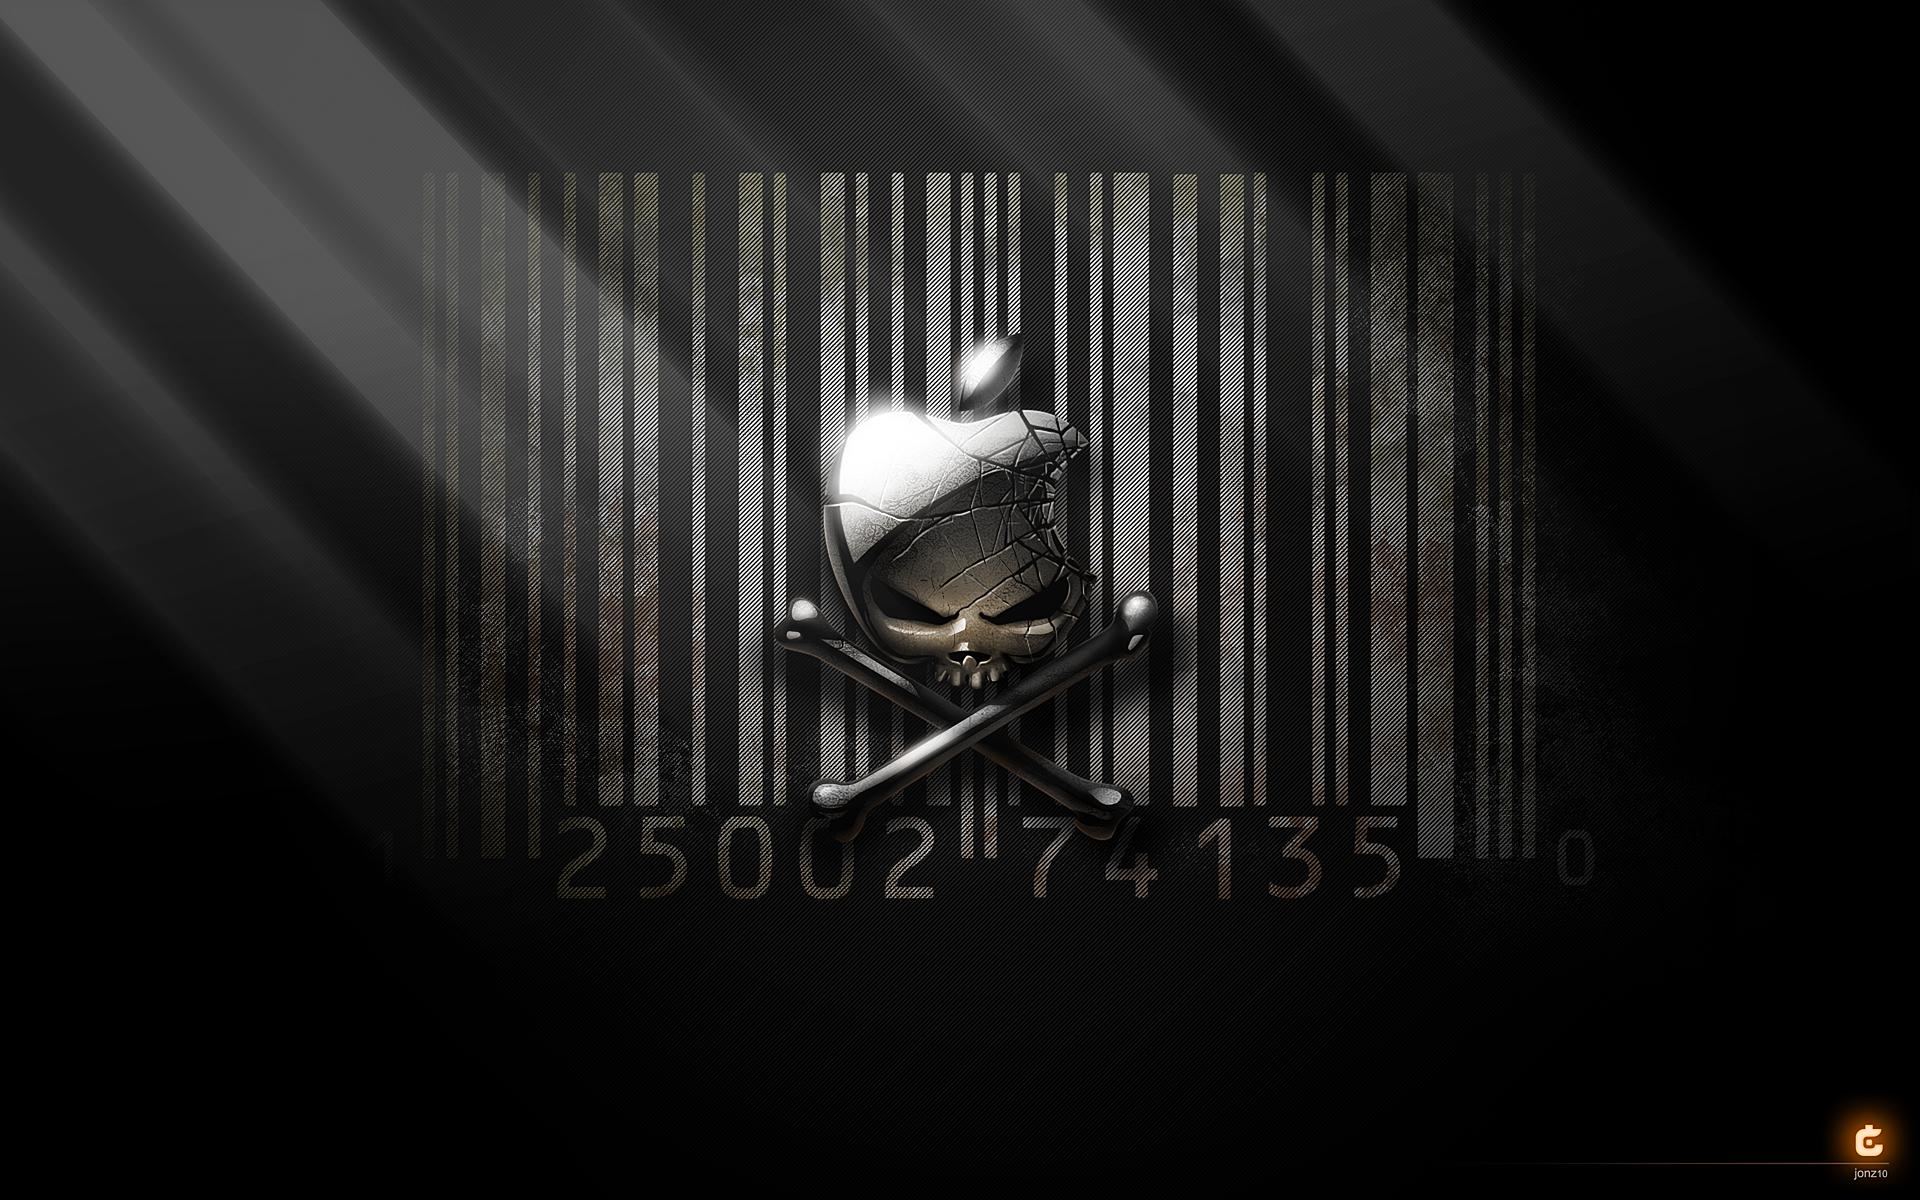 Hackintosh v5 Barcode